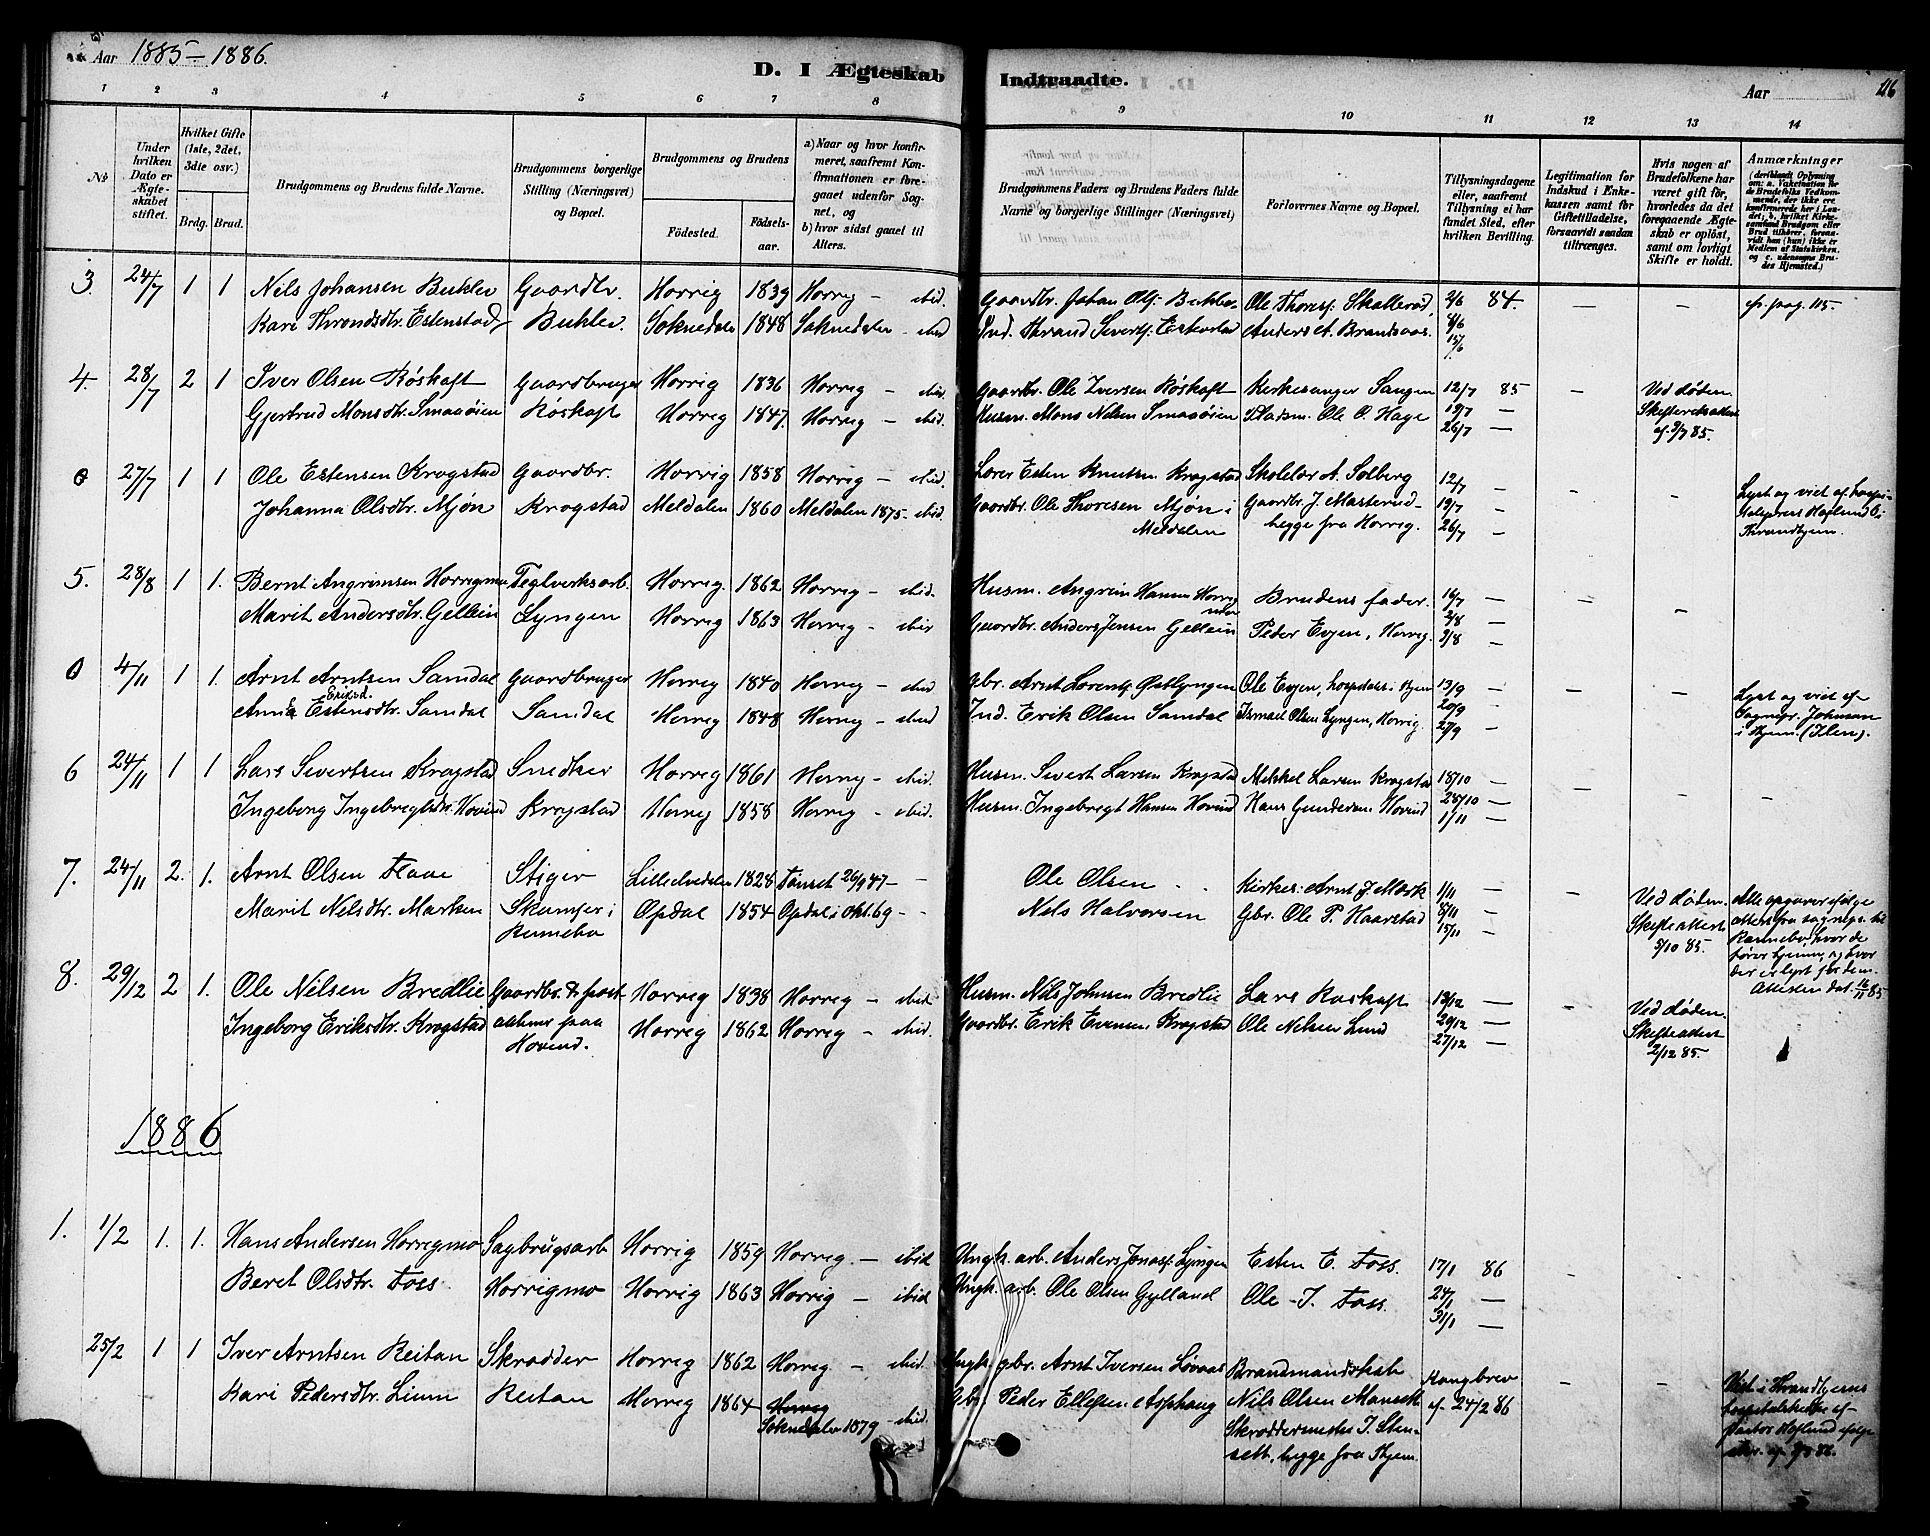 SAT, Ministerialprotokoller, klokkerbøker og fødselsregistre - Sør-Trøndelag, 692/L1105: Parish register (official) no. 692A05, 1878-1890, p. 116